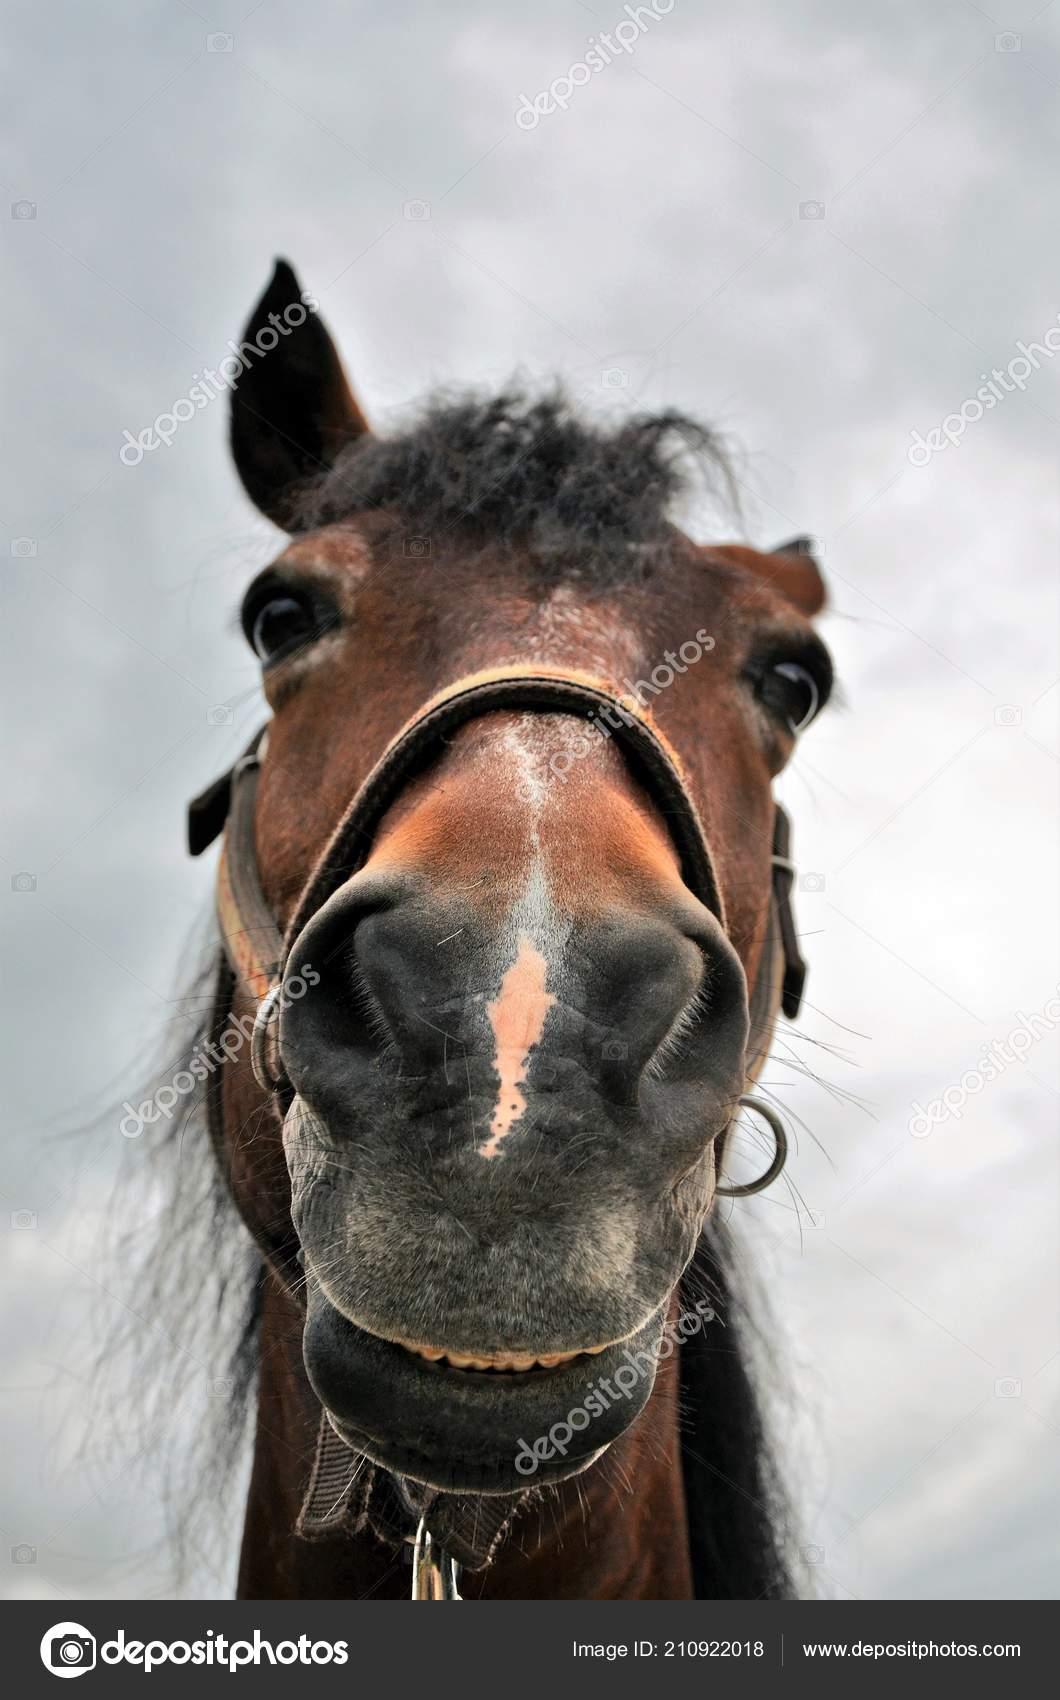 Funny Horse Head Close Stock Photo C Dewaardimar 210922018